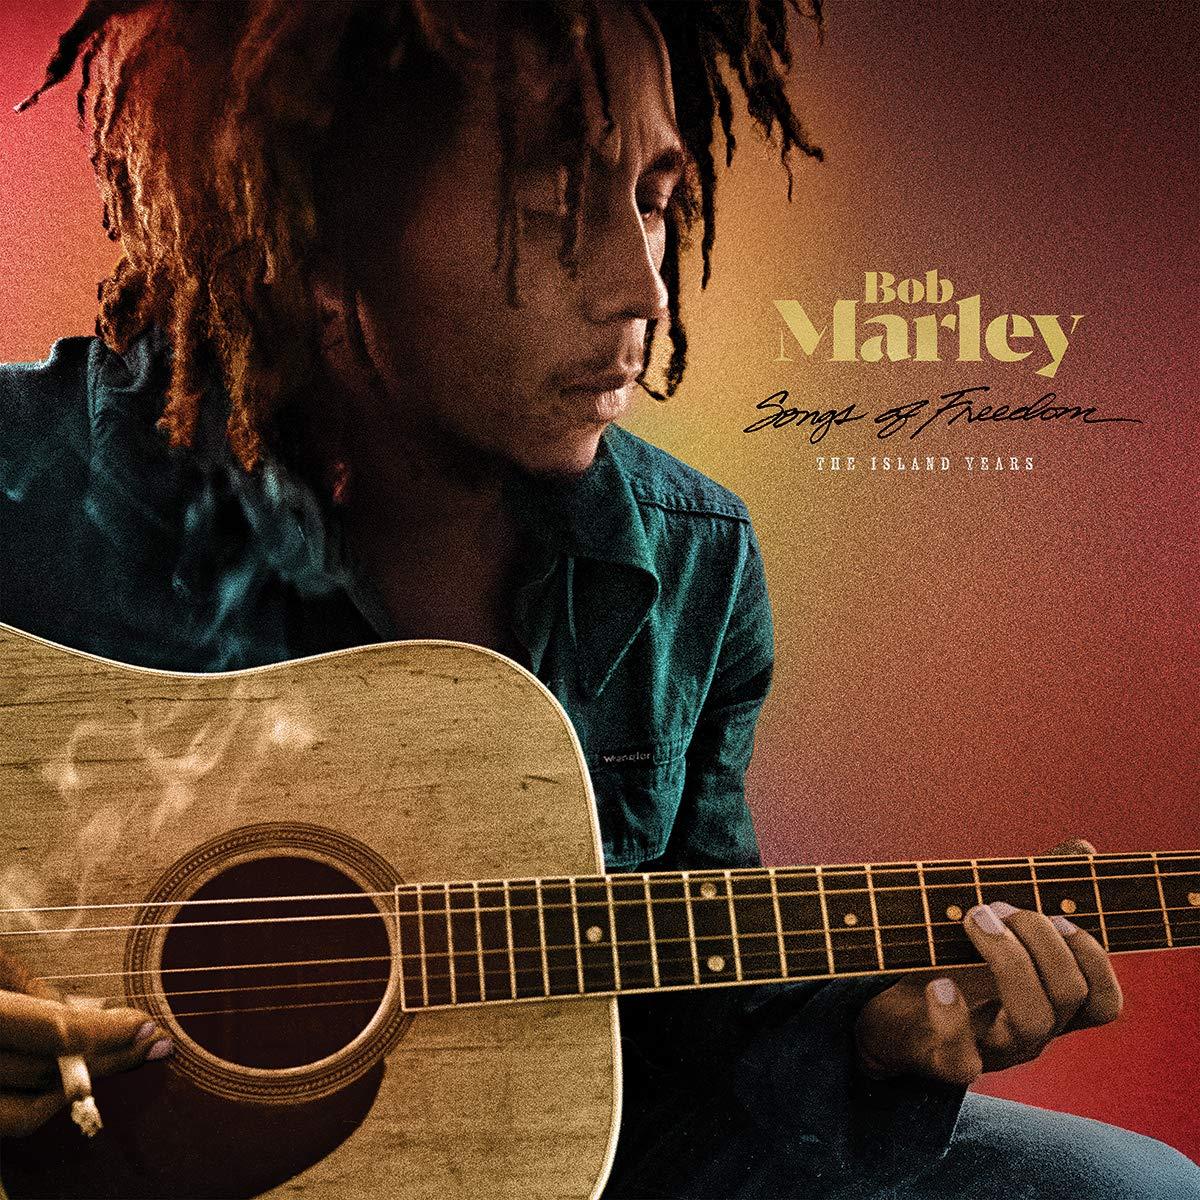 Songs of Freedom Bob Marley